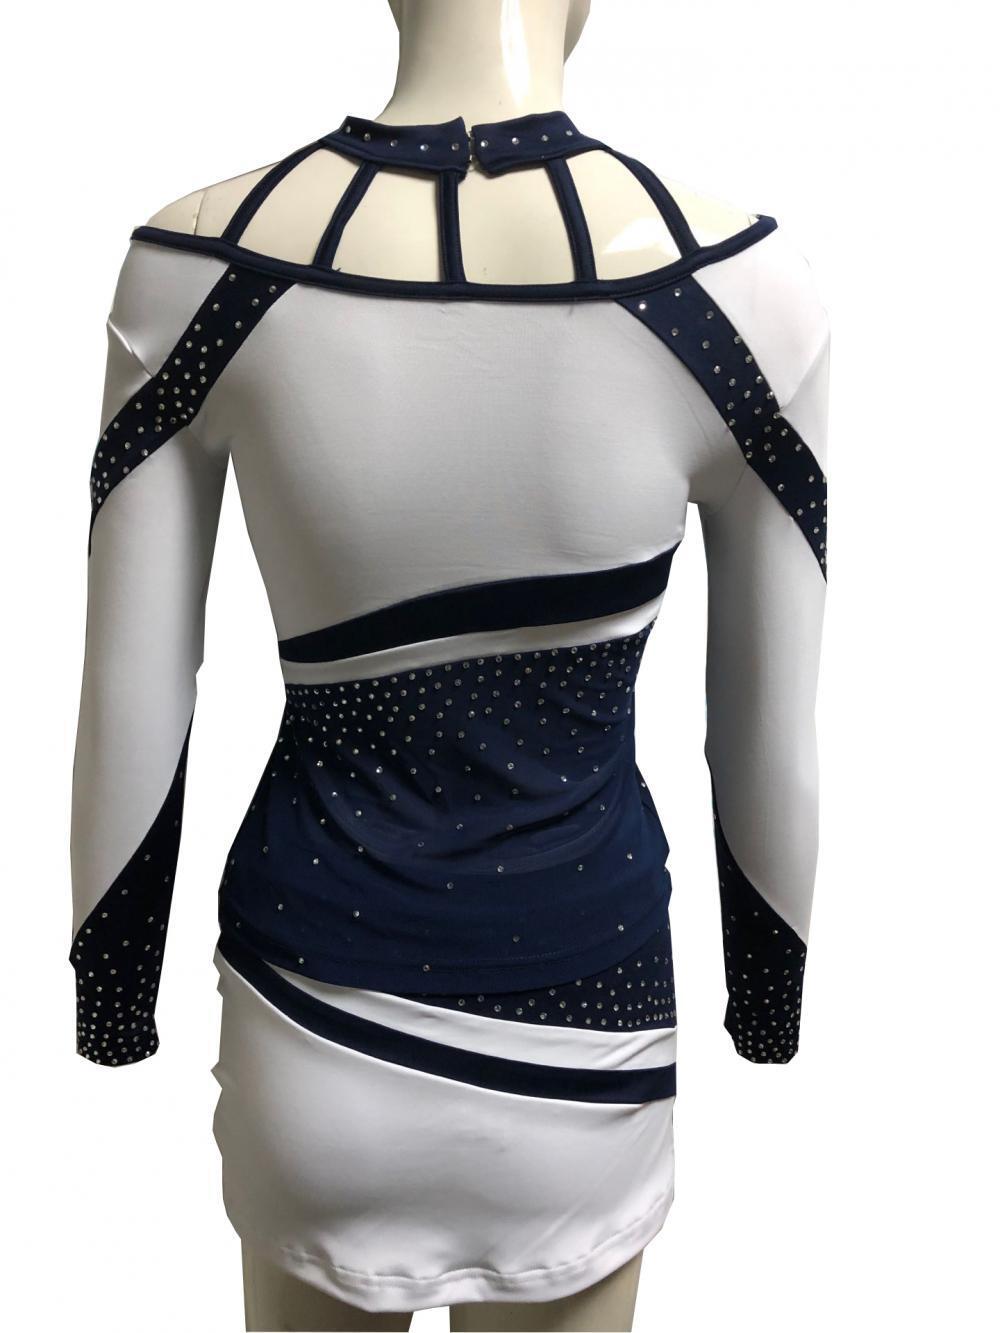 cheer uniforms